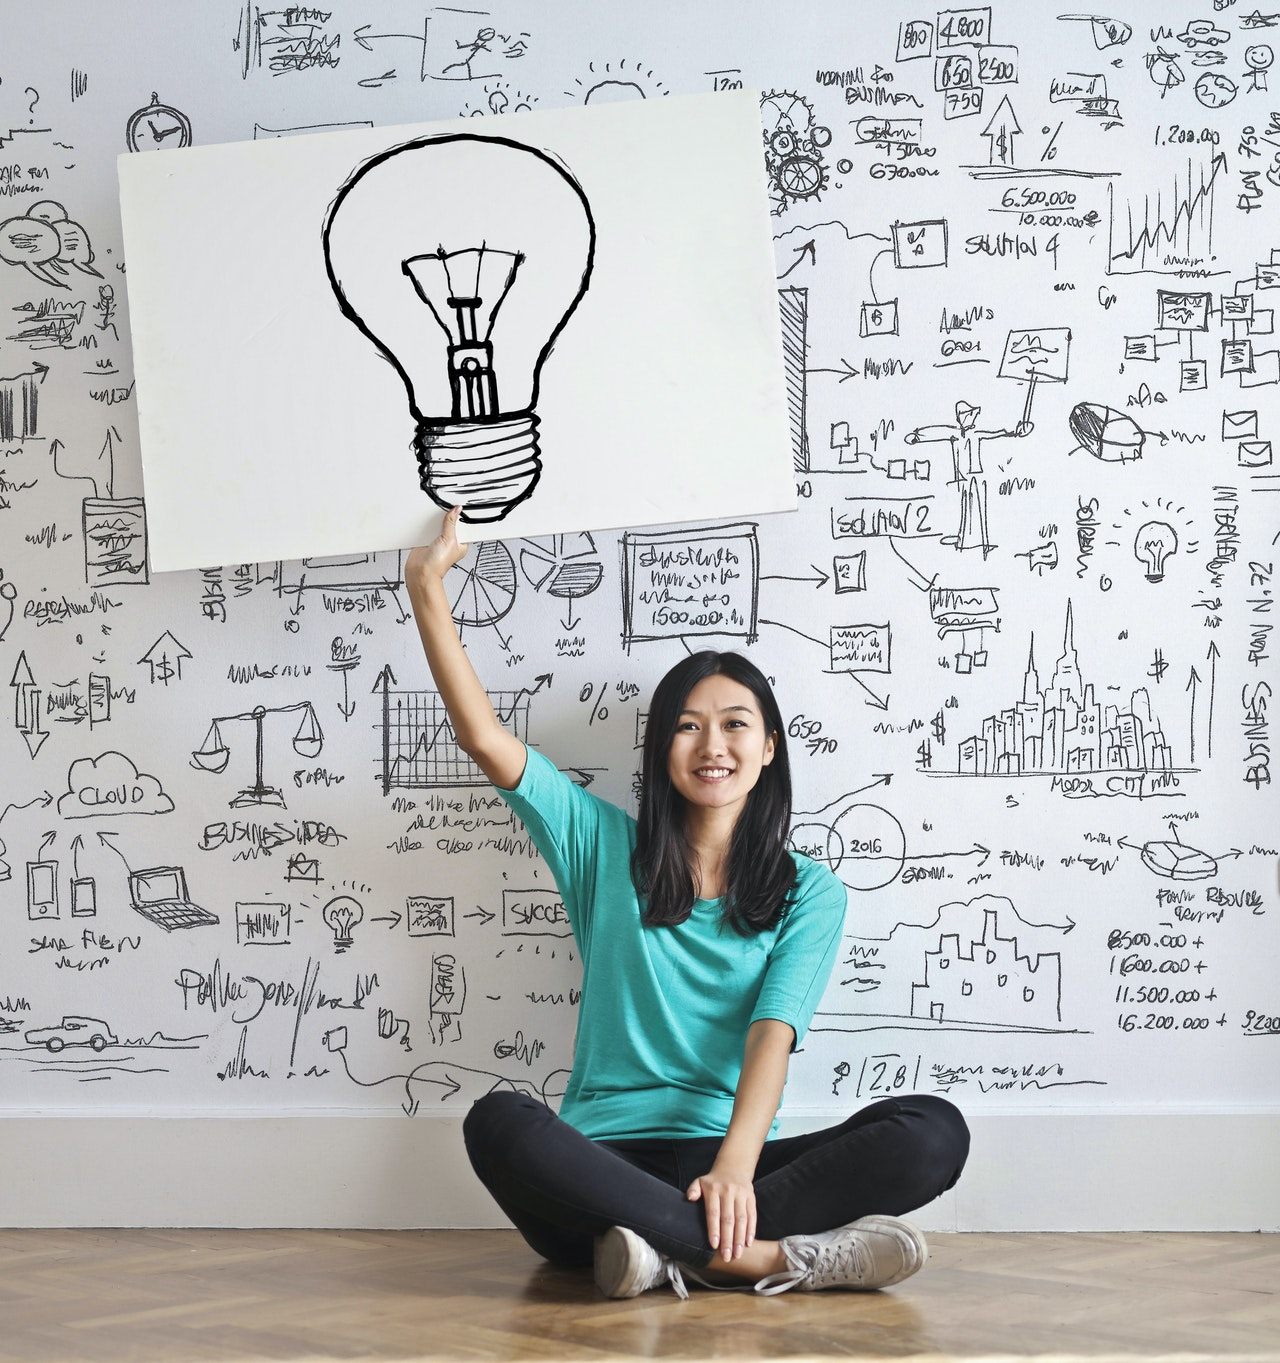 Brand strategy brainstorming